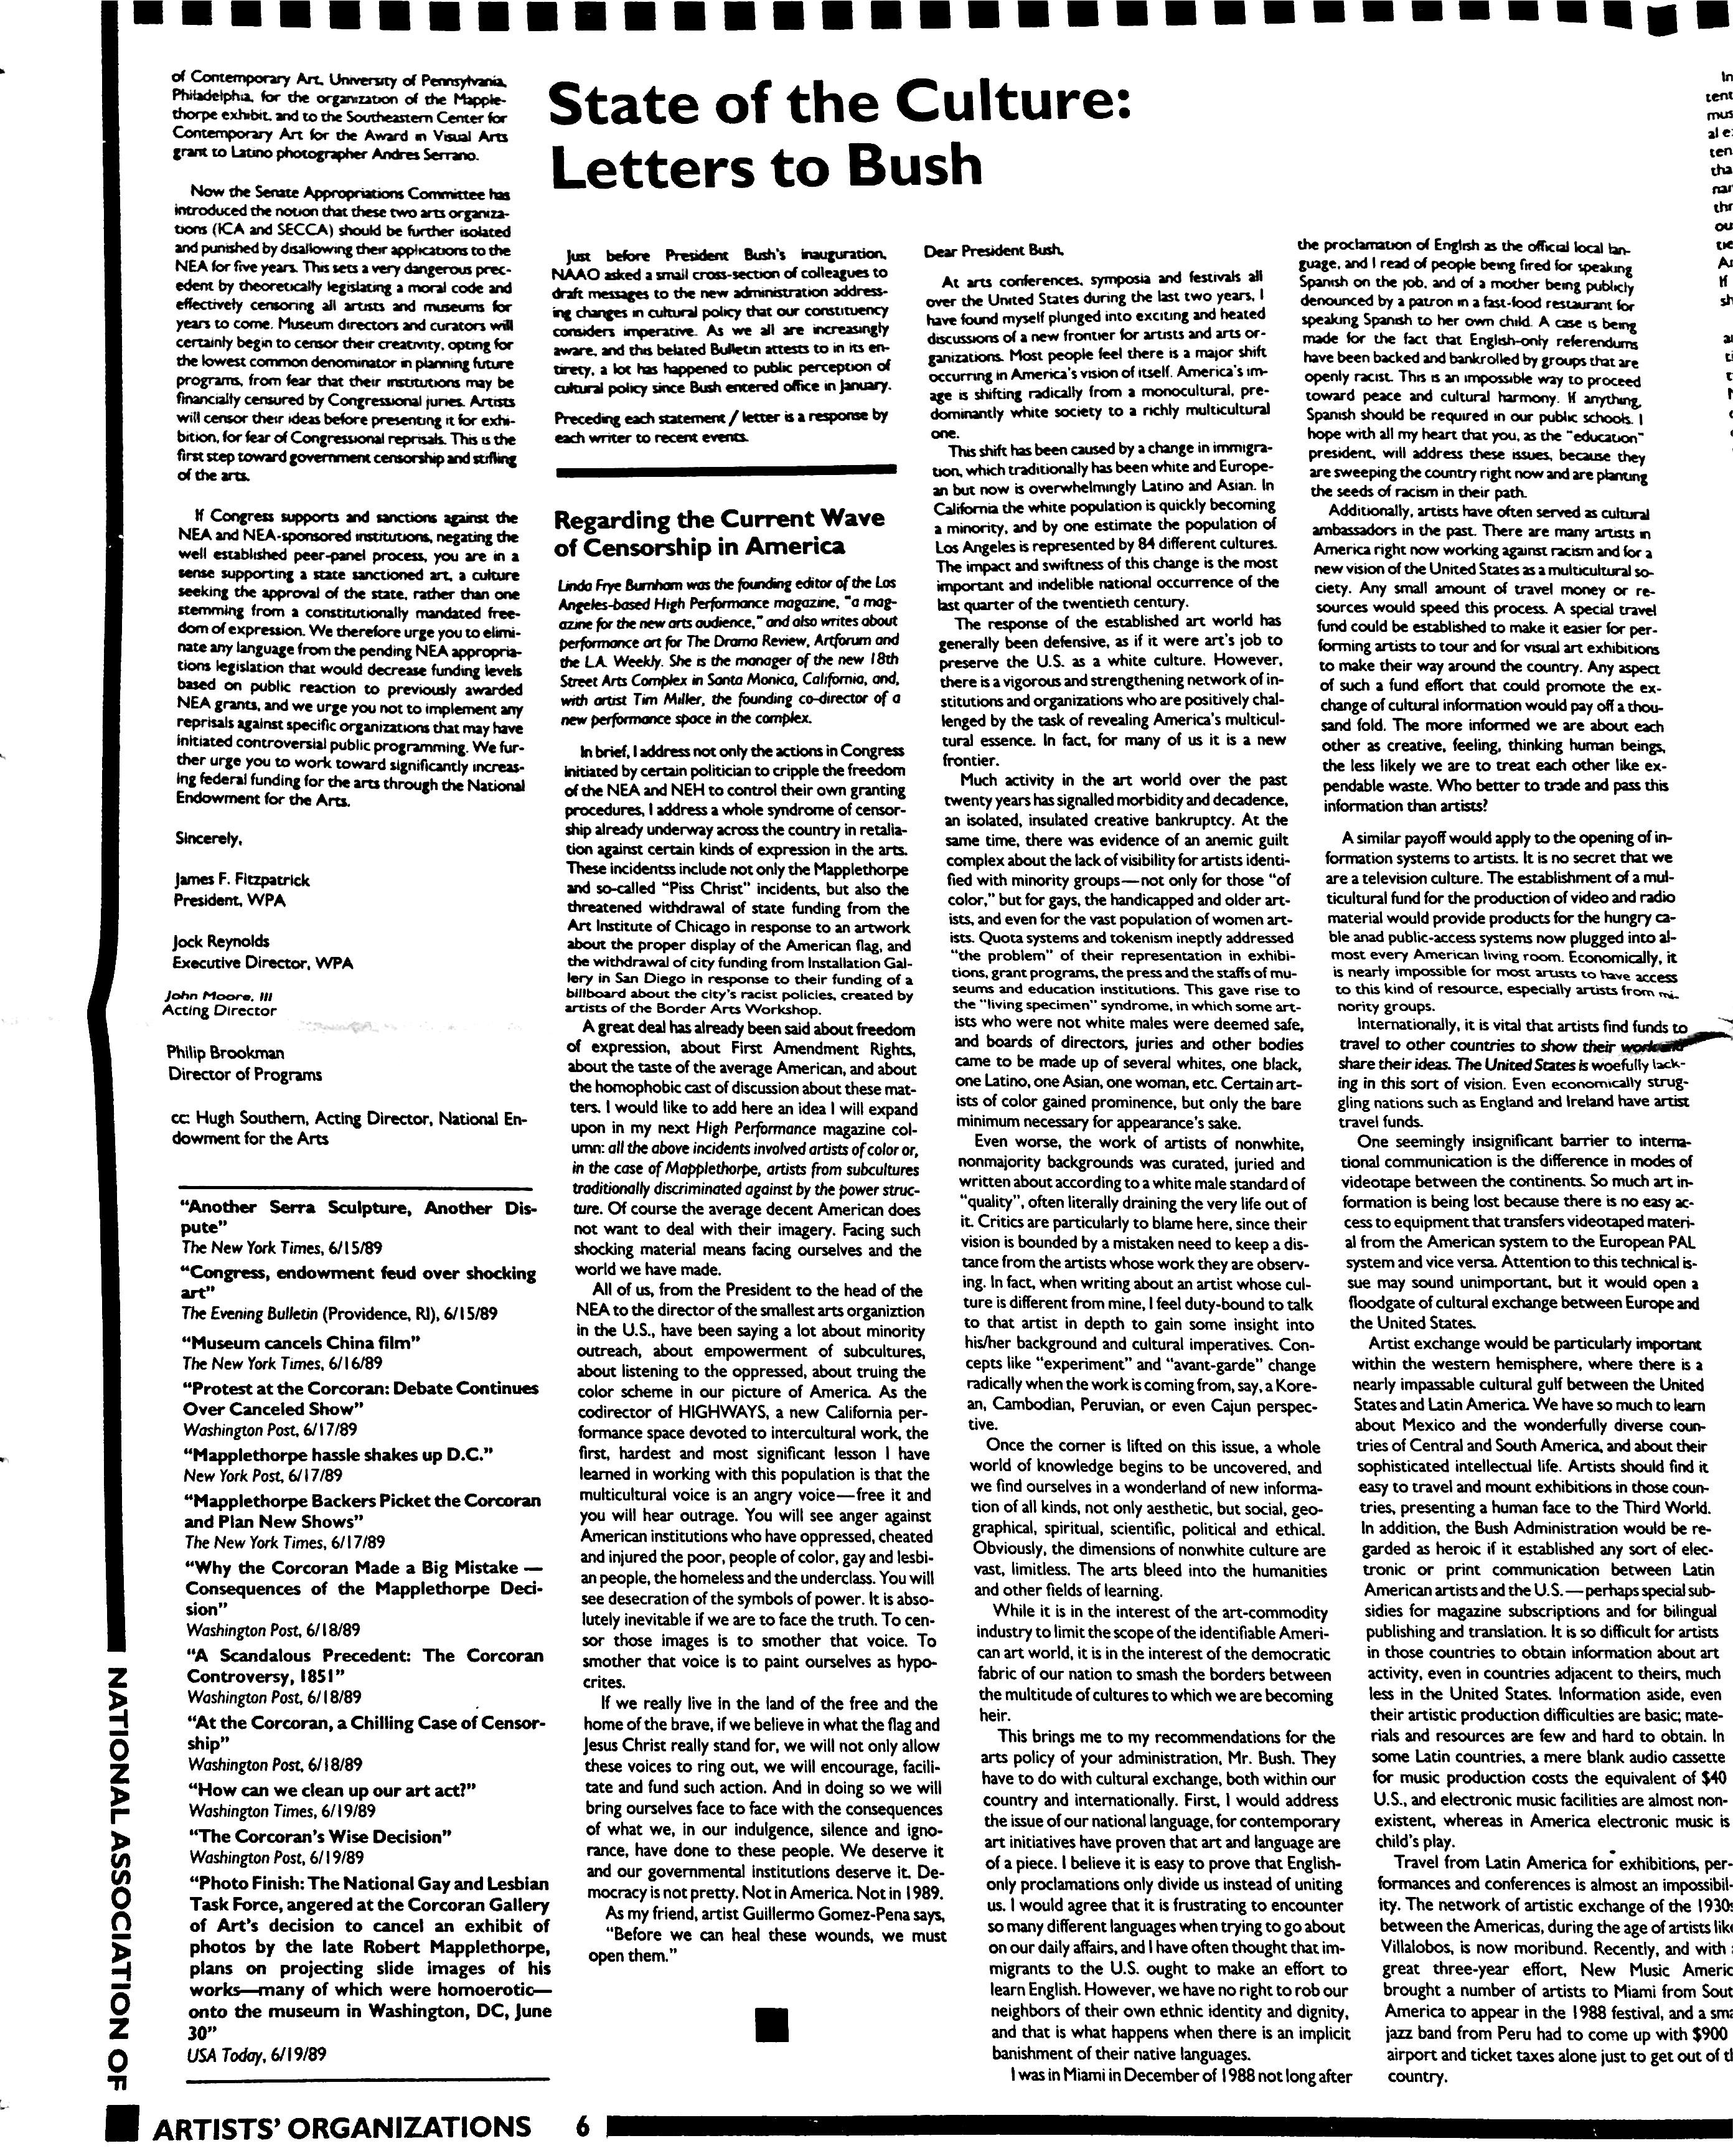 August 1989 - NAAO Bulletin Page 7.jpg